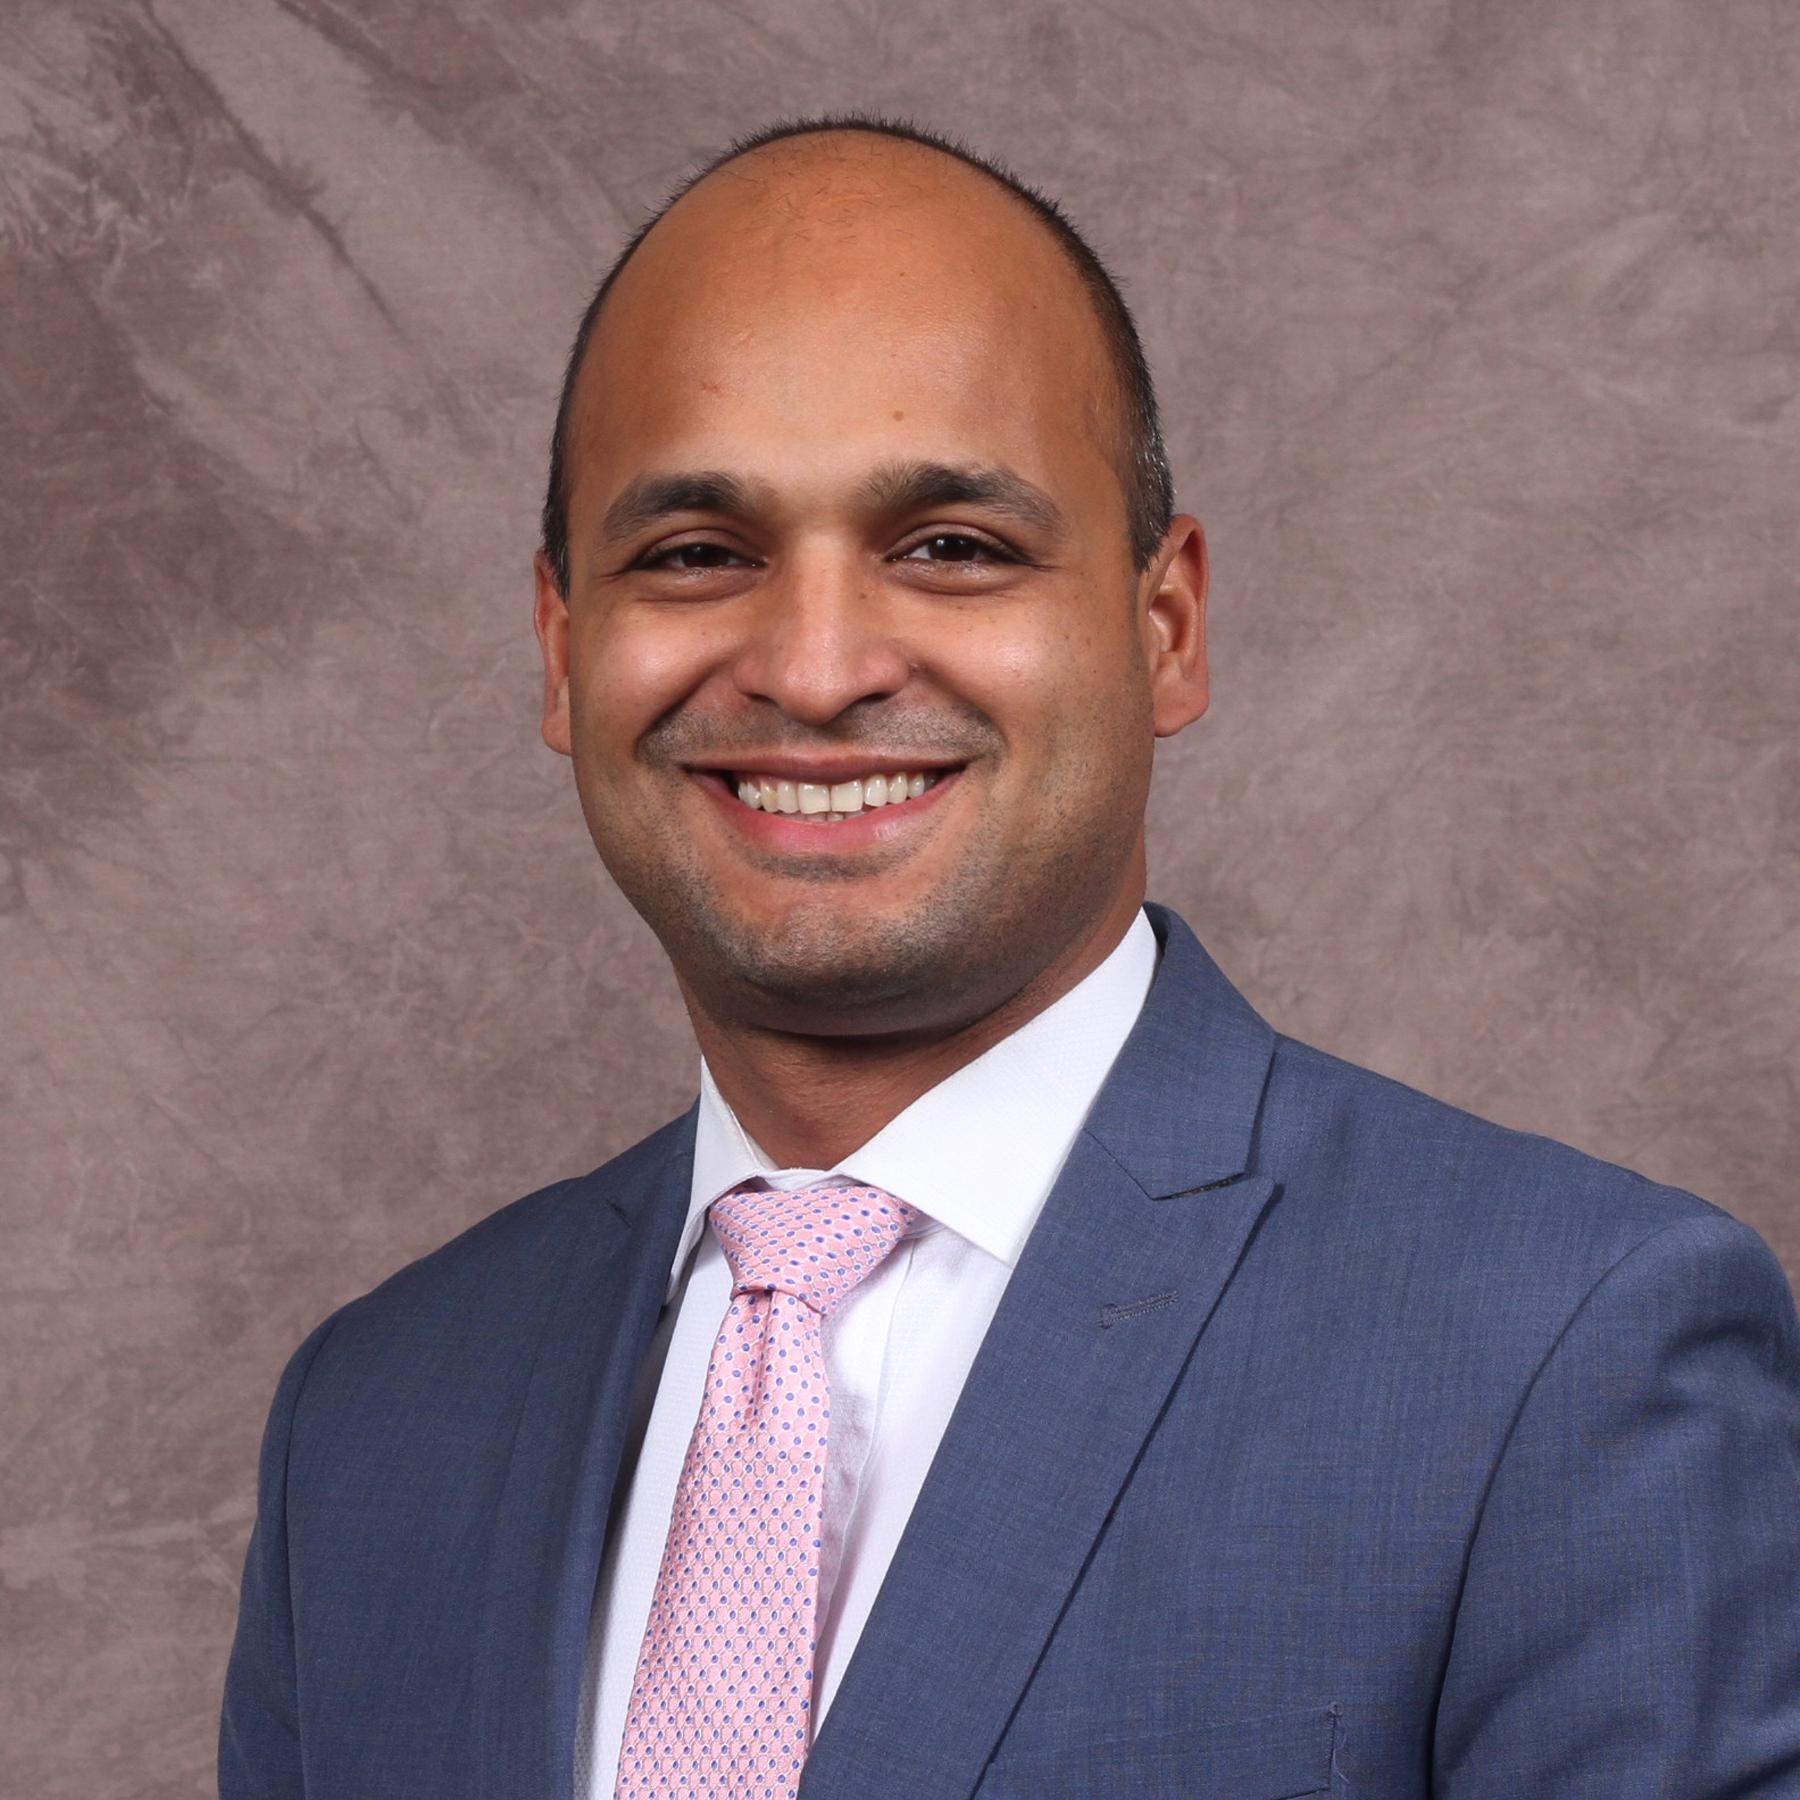 Nishant Jadav